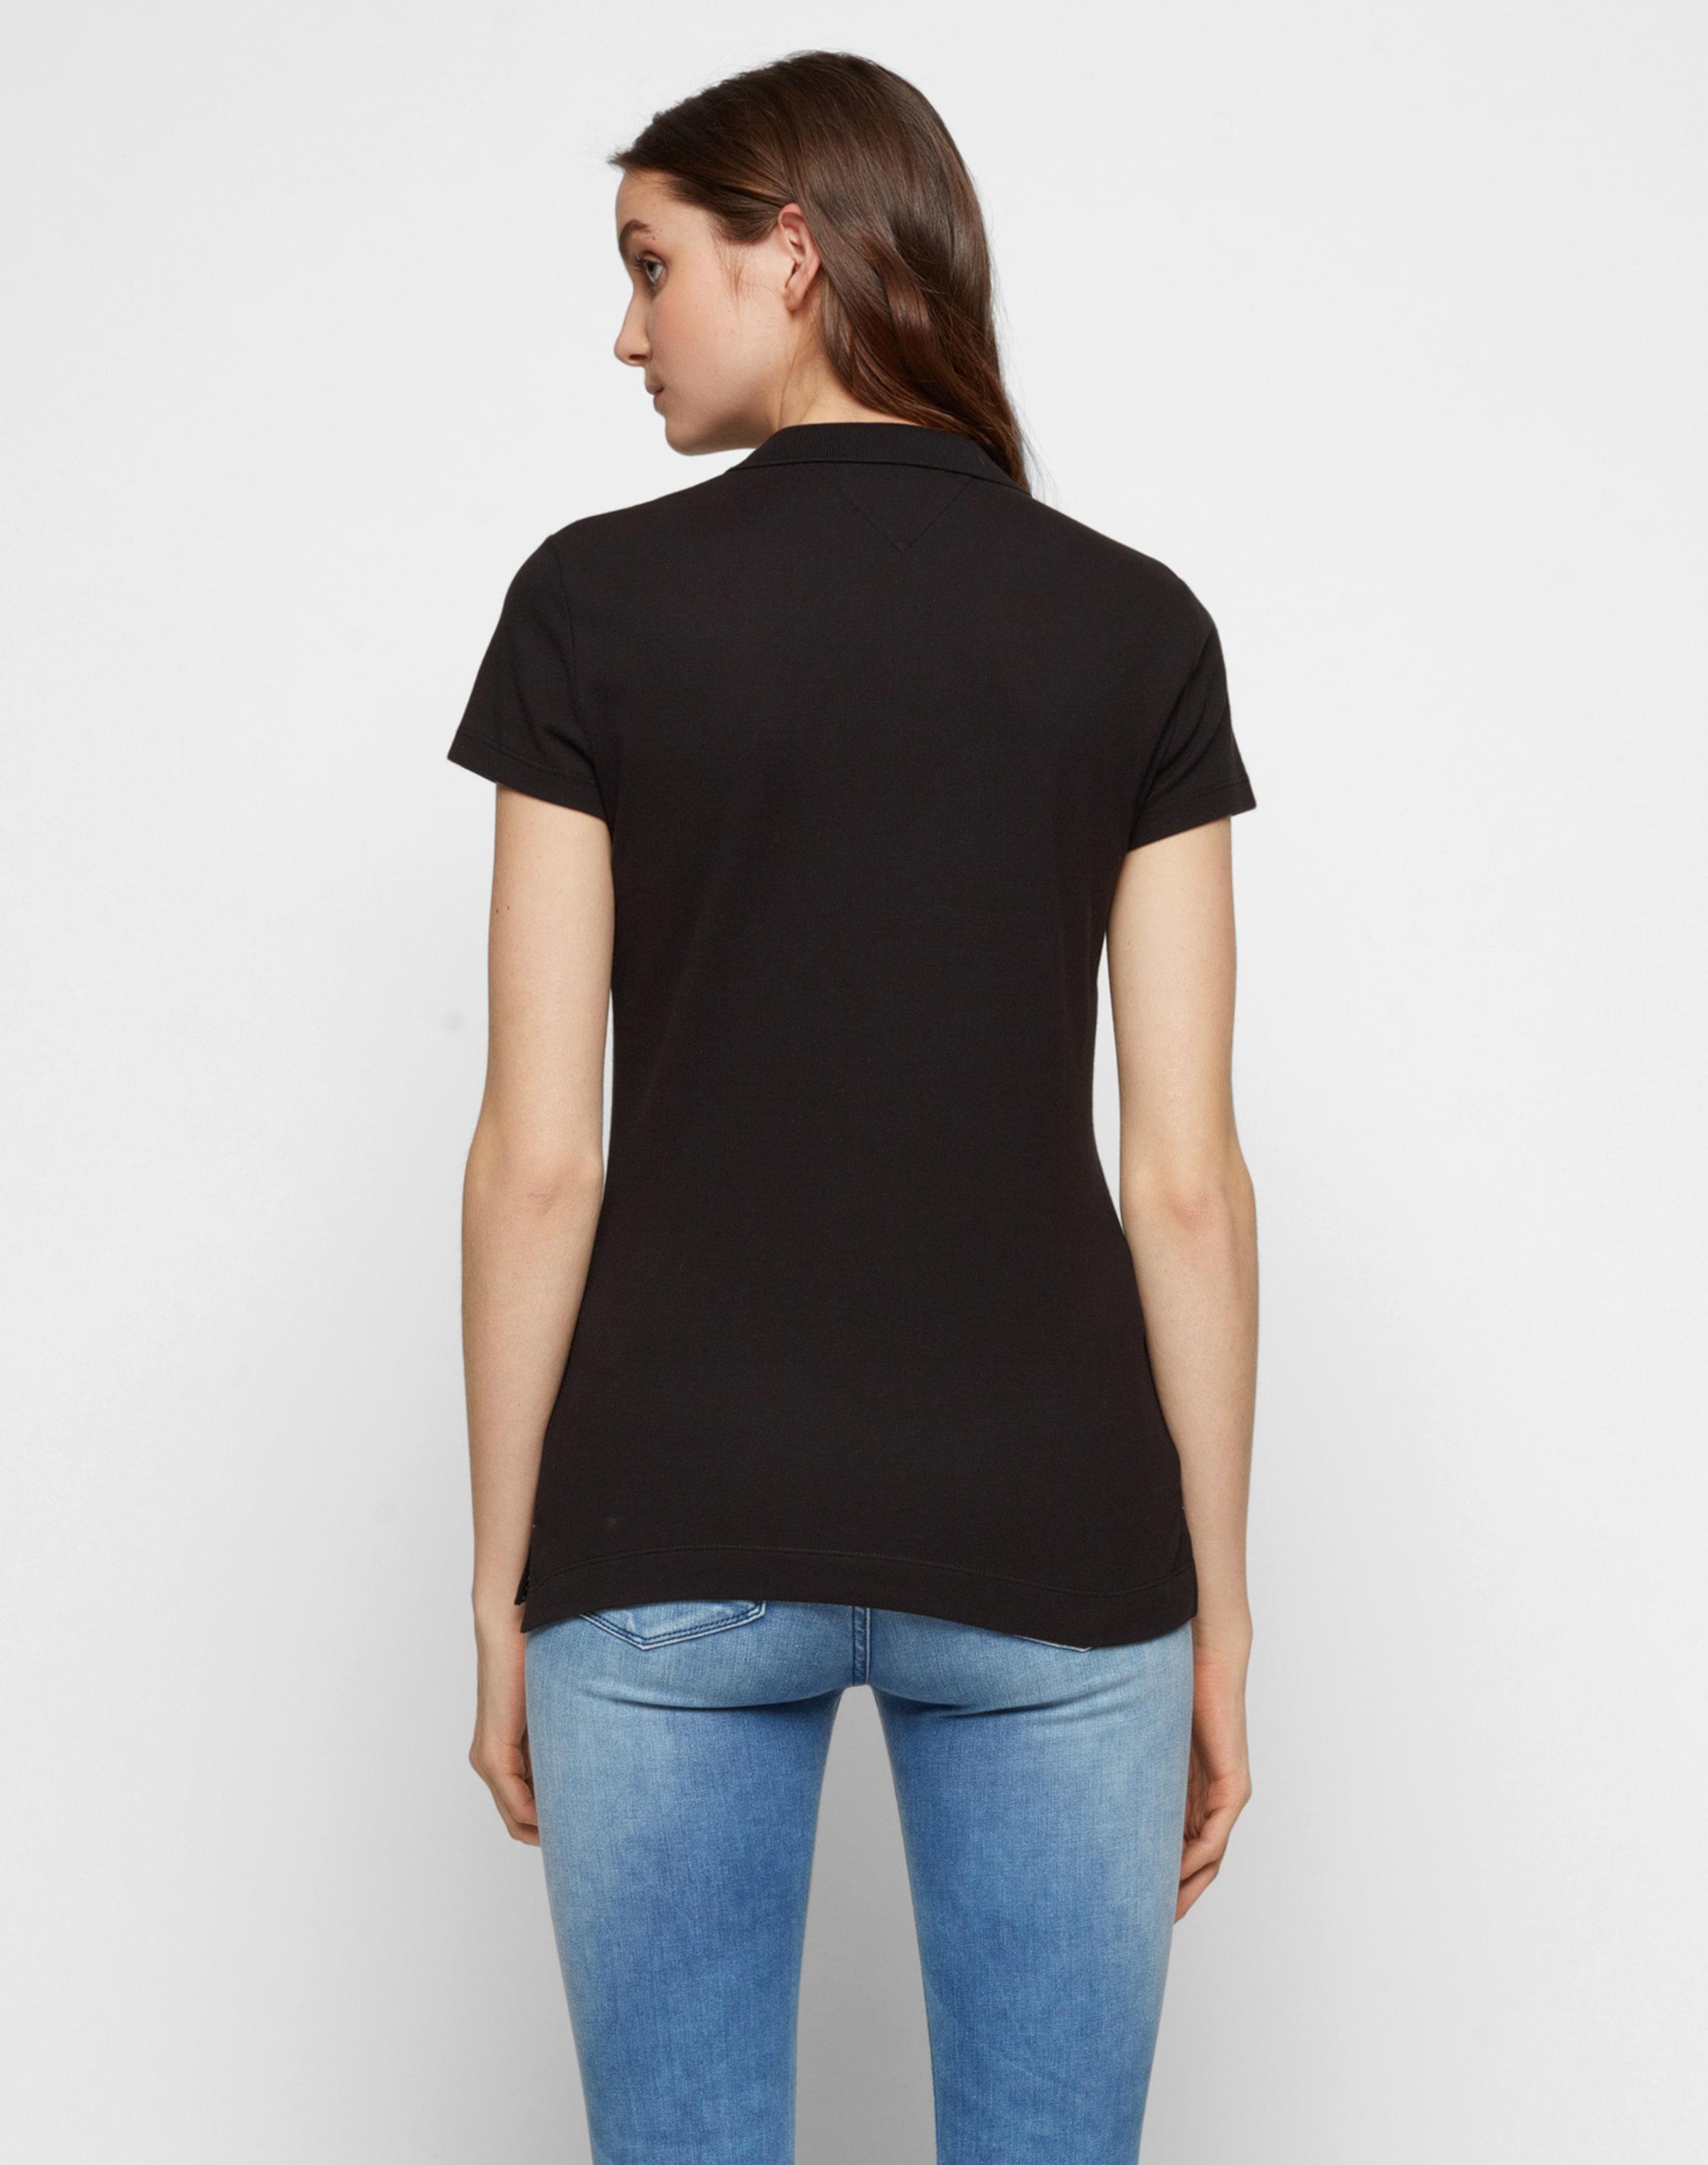 TOMMY HILFIGER Shirt 'Chiara' Gut Verkaufen Rabatt Footaction IgpCC